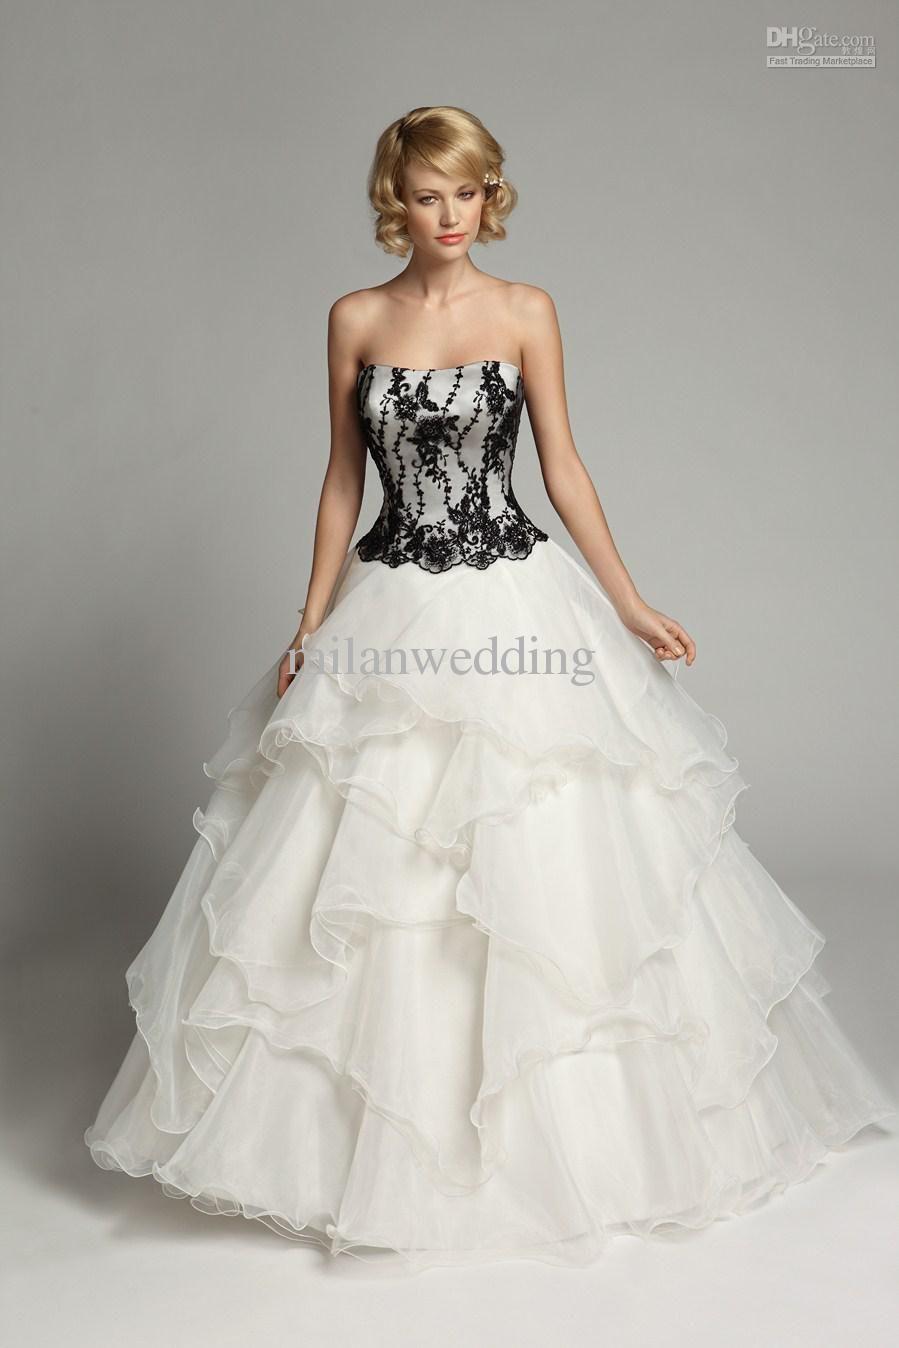 Pin by Jenna Holaday on Wedding dresses | Pinterest | White wedding ...